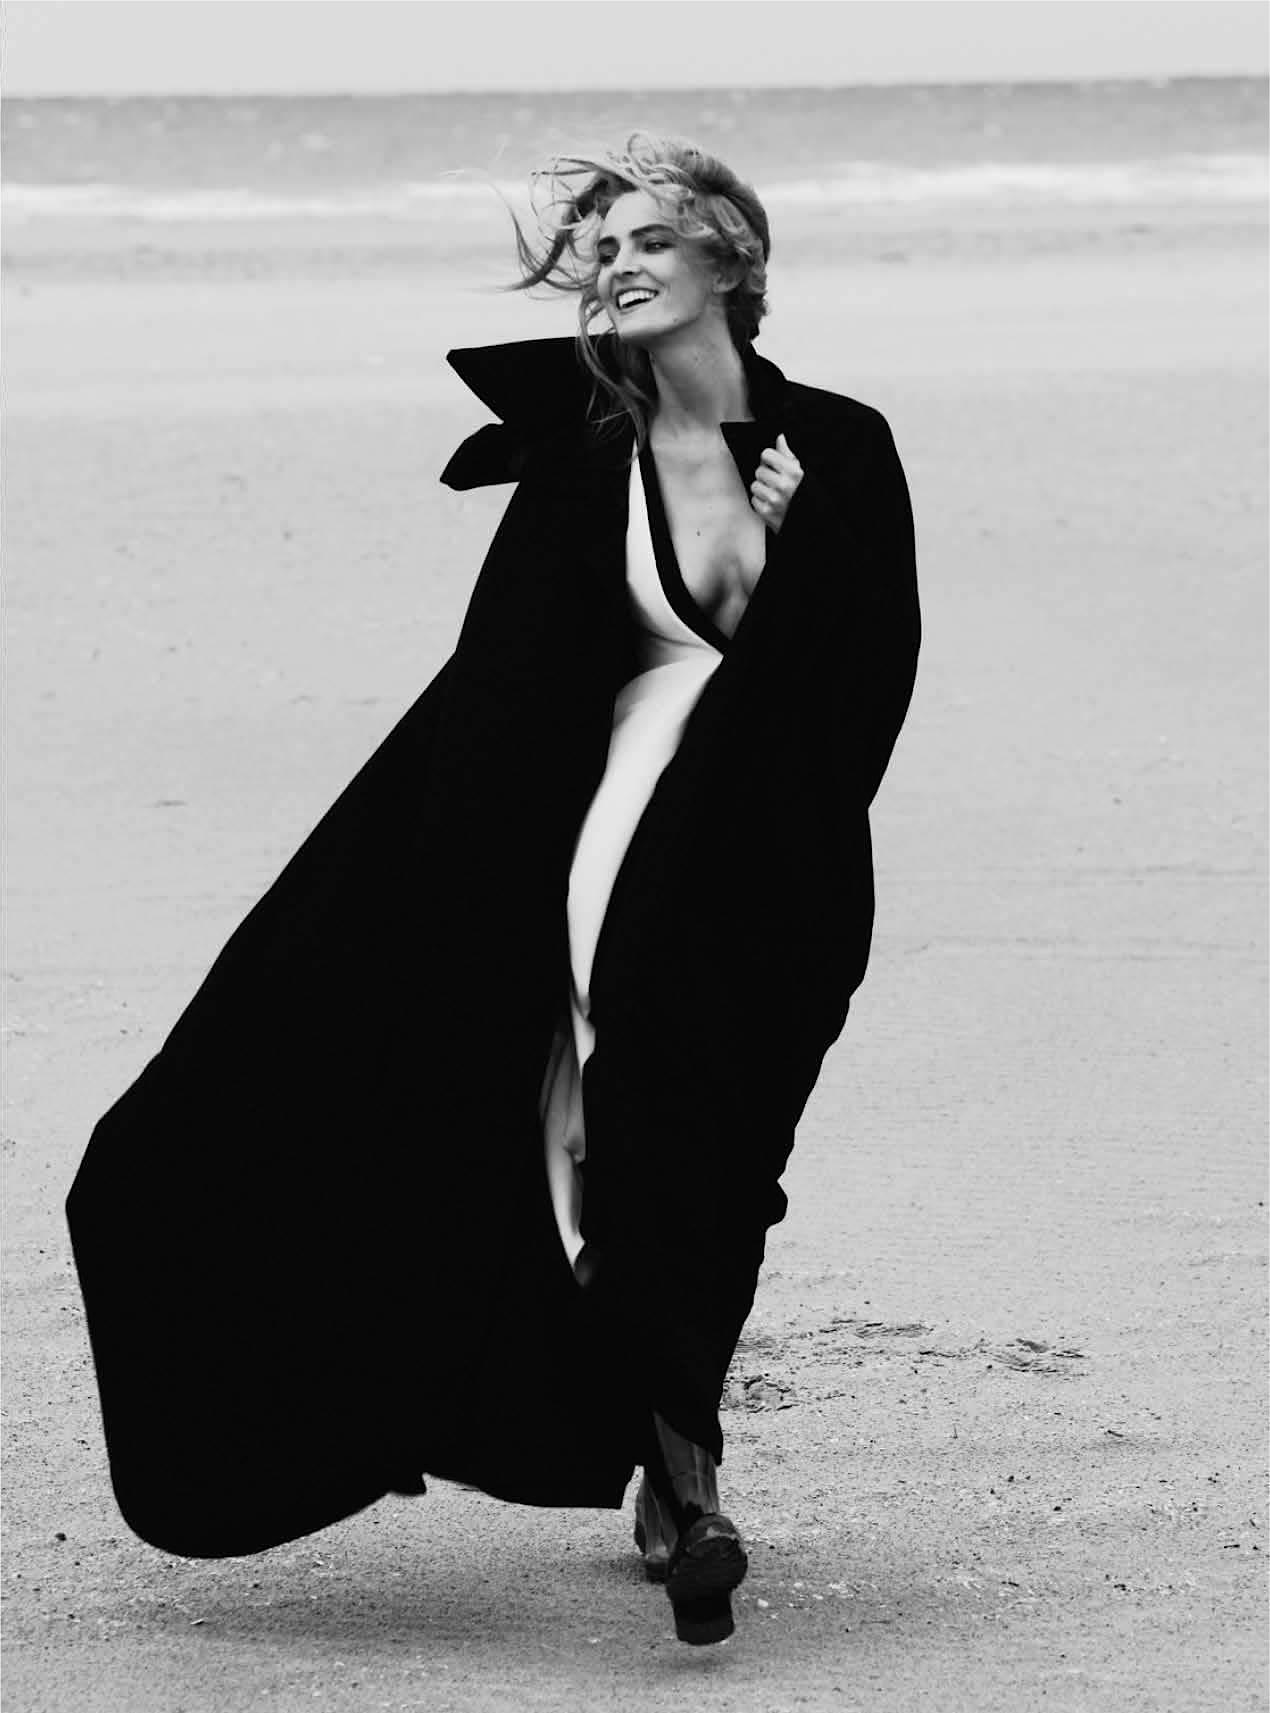 платье из шелка, Valentino; широкий черный плащ, Azzedine Alaia; резиновые сапоги, Aigle